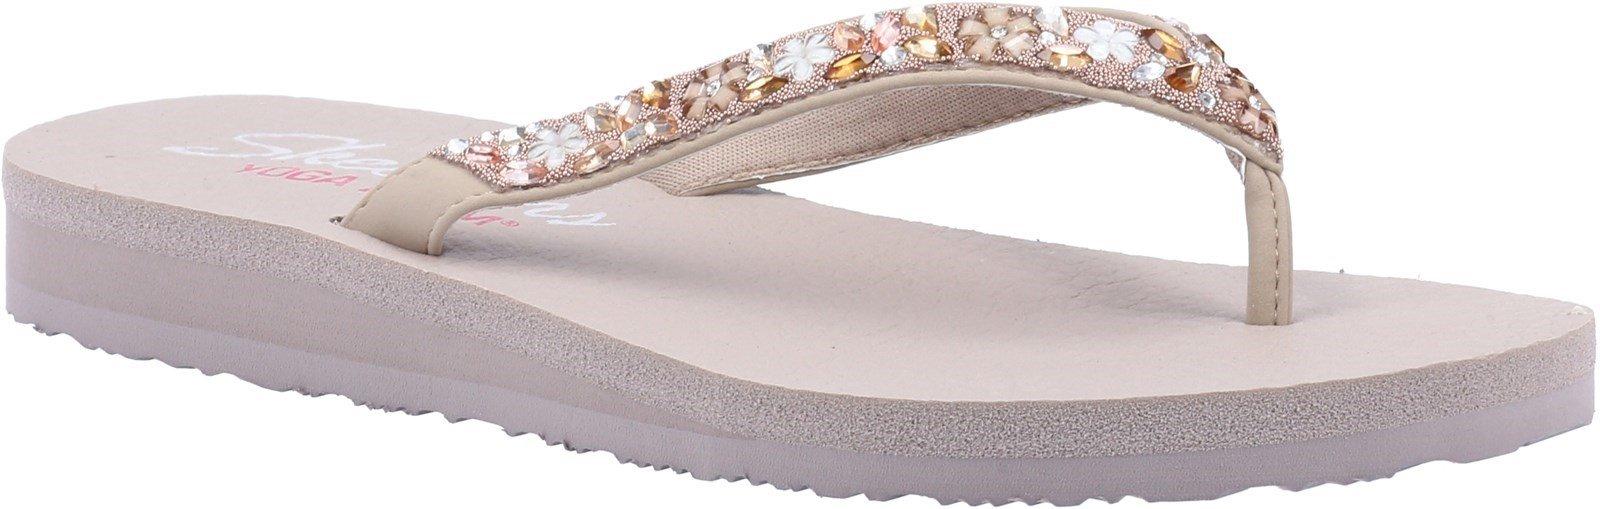 Skechers Women's Meditation Daisy Summer Sandal Various Colours 32175 - Taupe/Multi 3